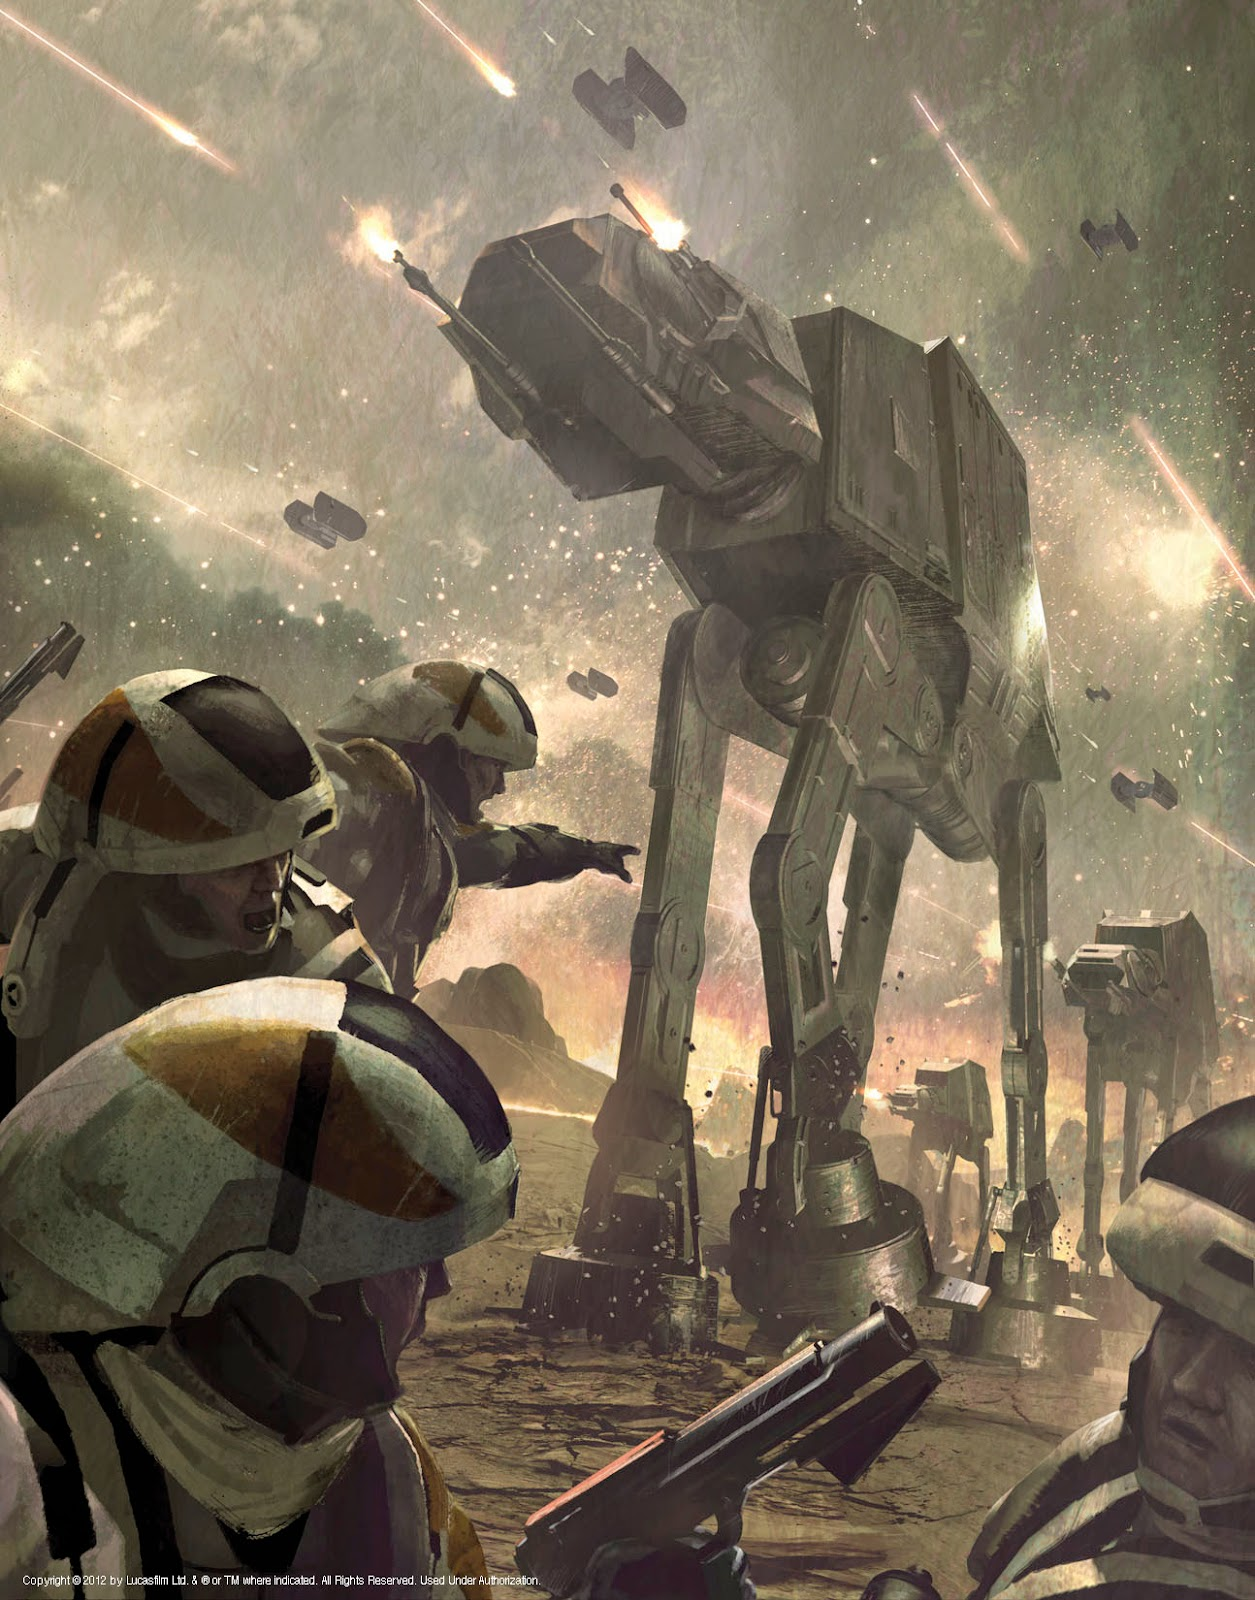 Combat between rebels and the empire